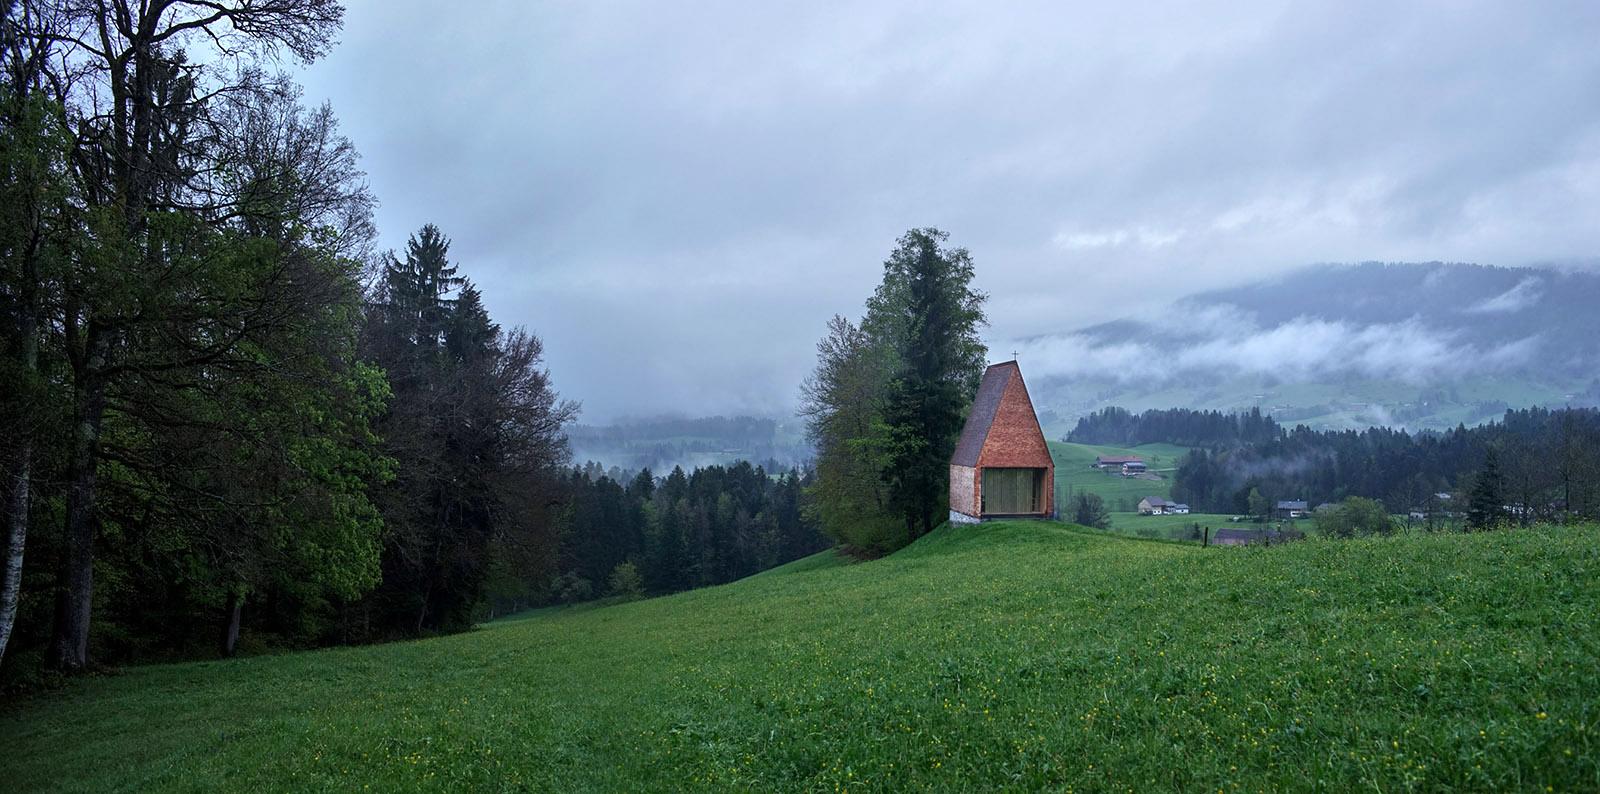 salgenreute-chapel-bernardo-bader-photo-jean-nicolas-lechat-urbantyper-4